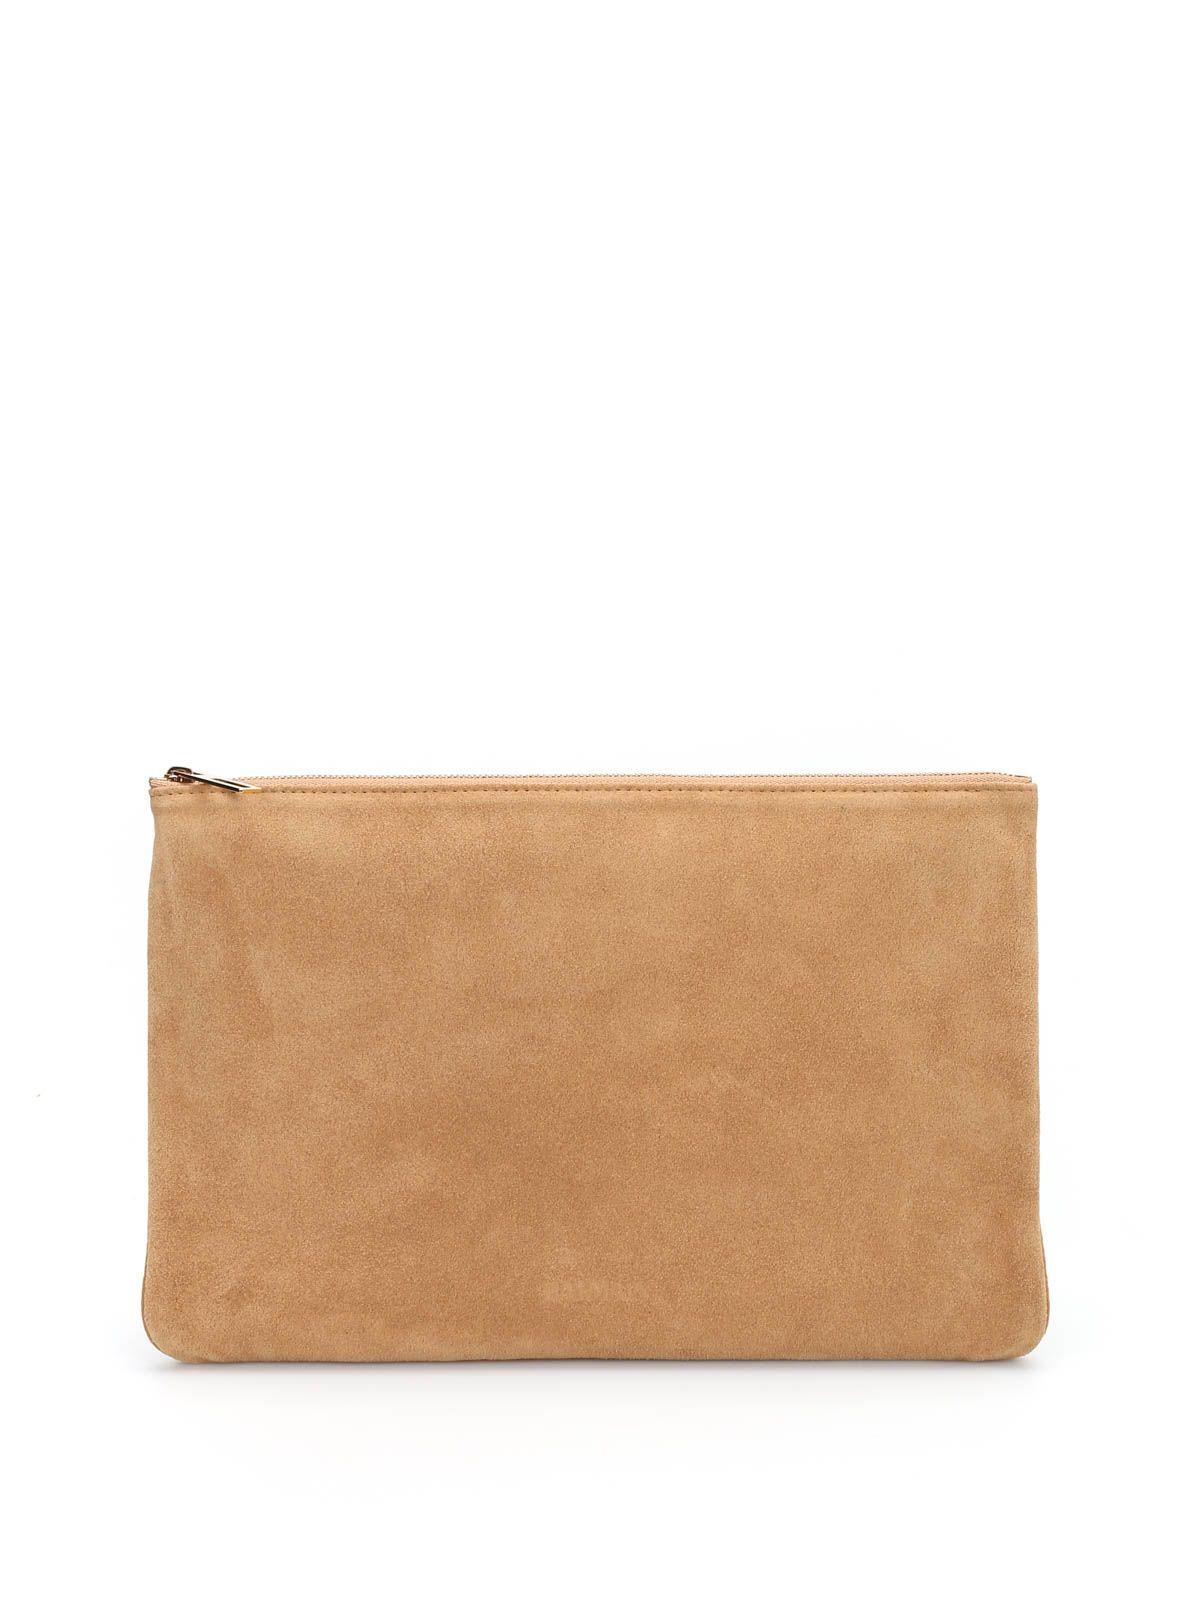 Suede Handbag Pochette